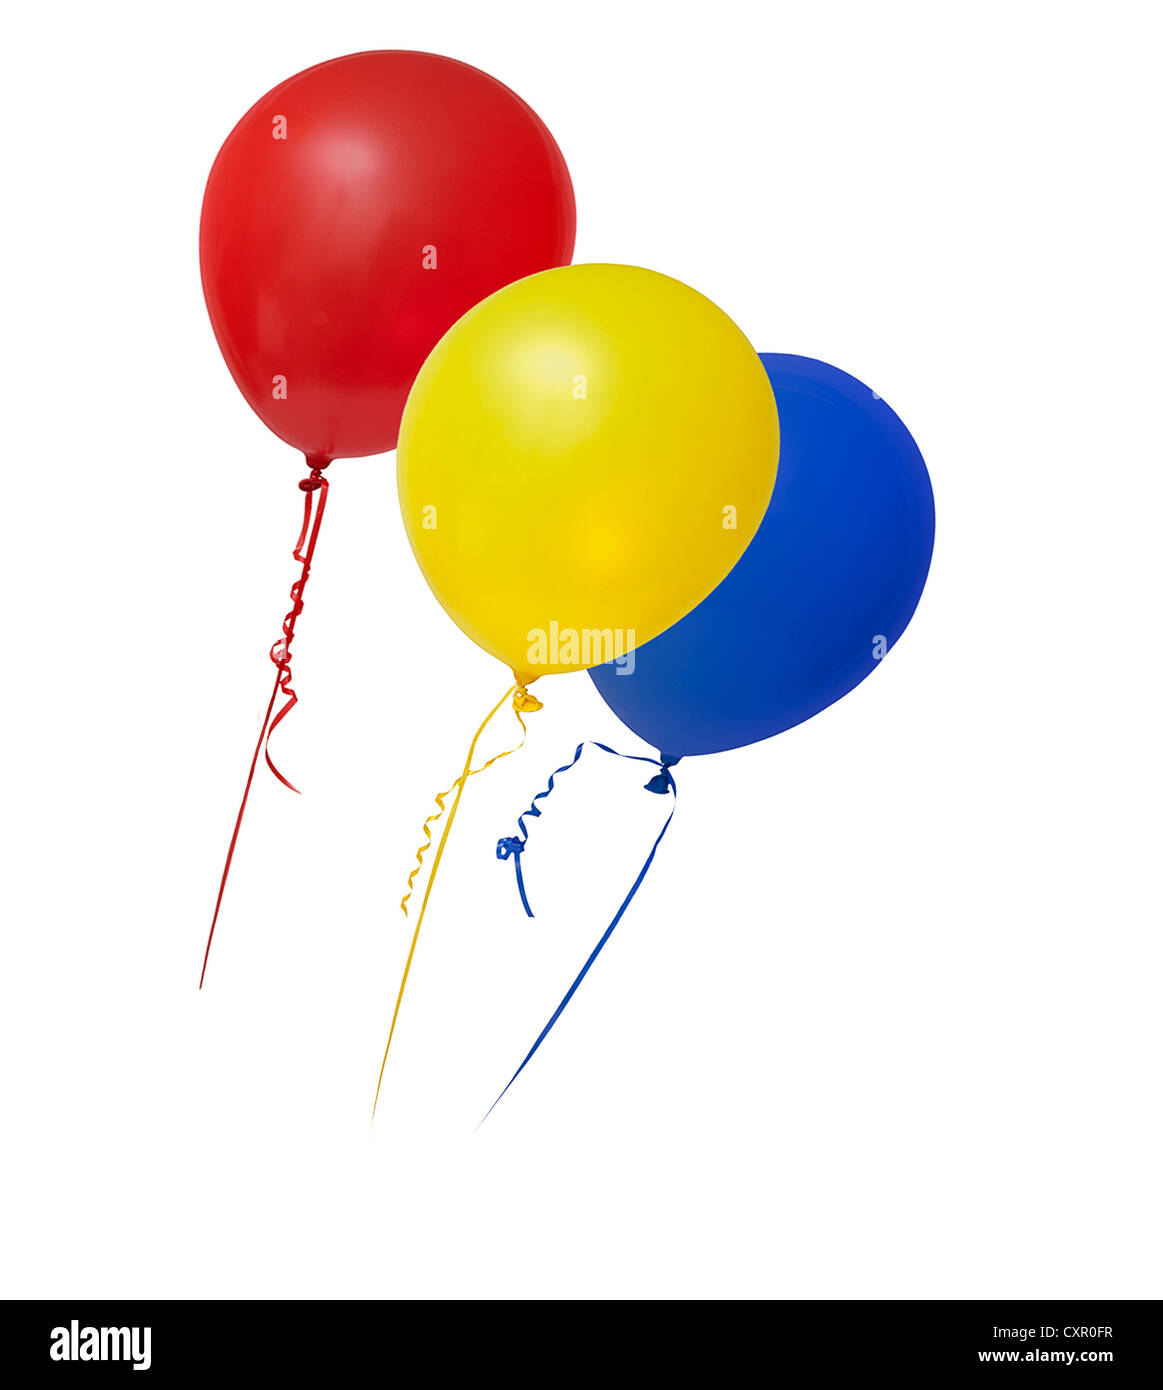 Ballons en couleurs primaires Photo Stock